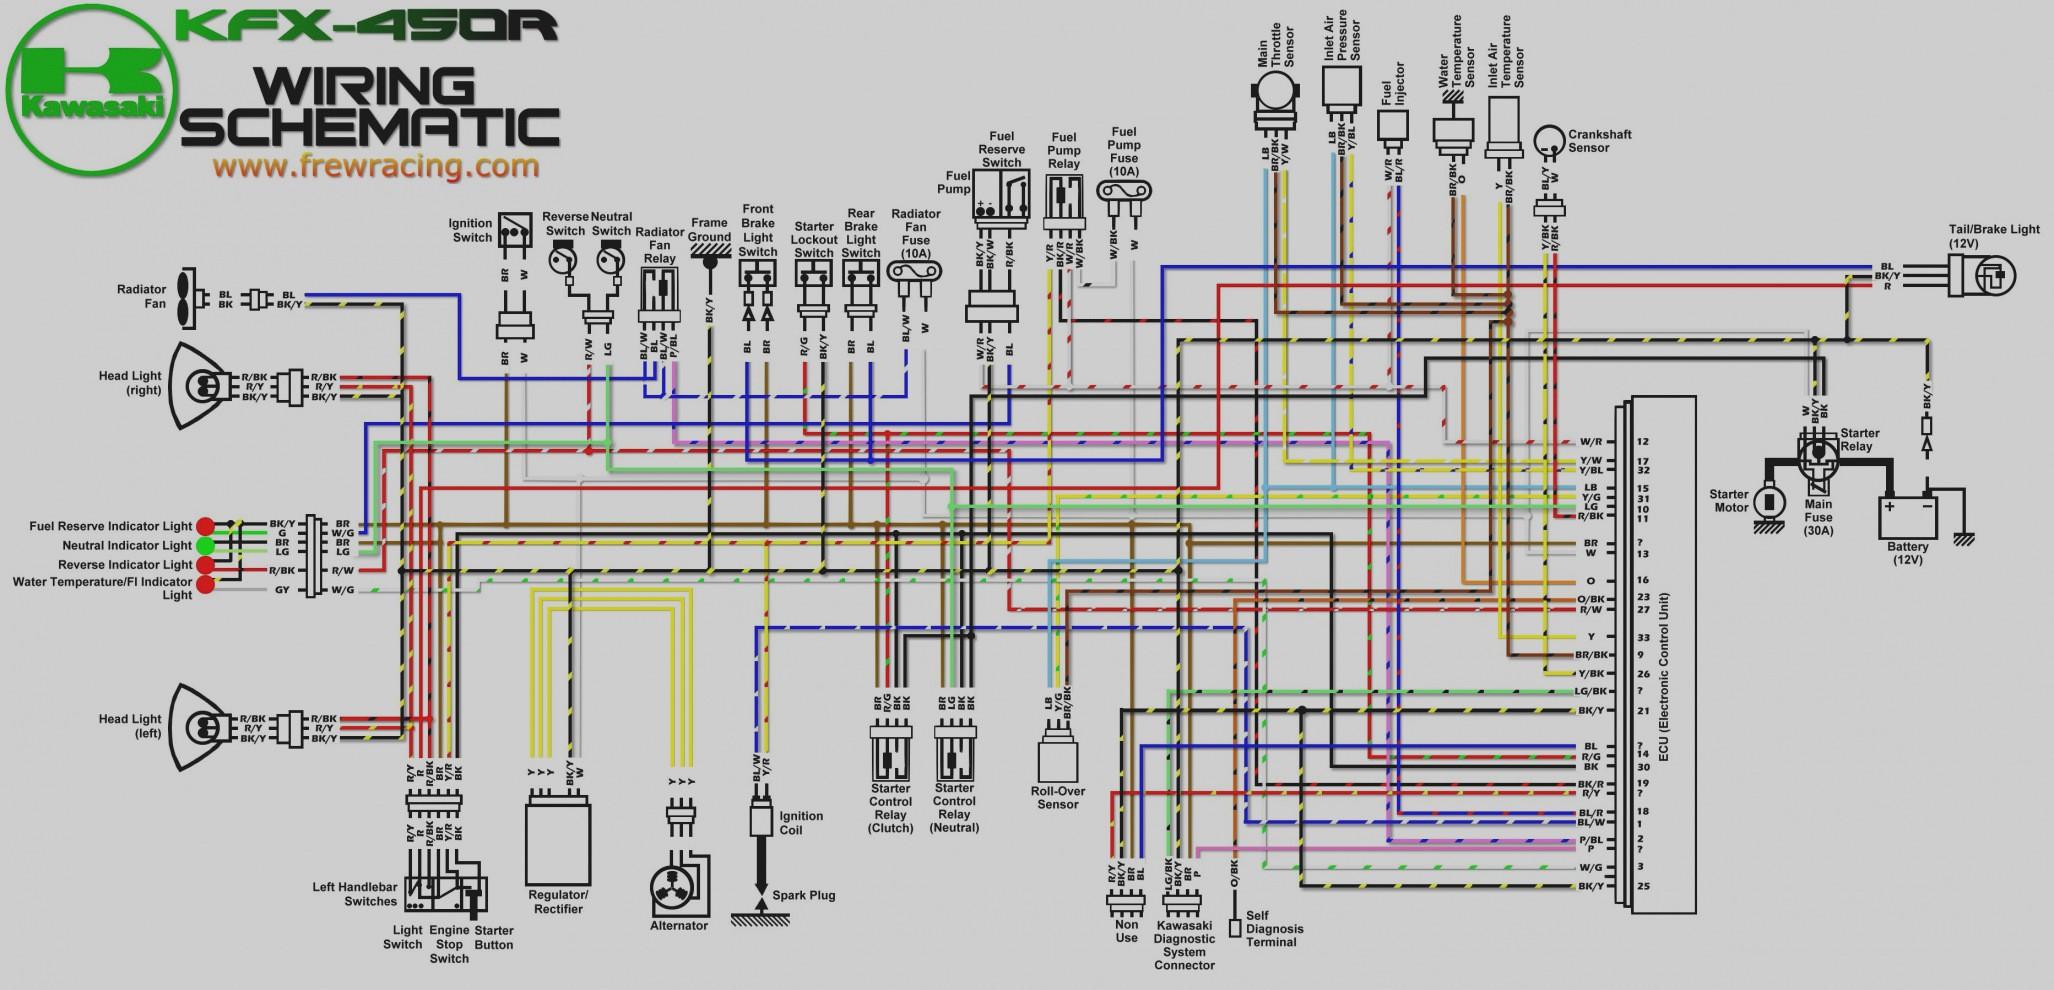 2007 yamaha yfz450 wiring schematic - jeep cj7 ignition switch wiring  schematic for - wiringdol.jeanjaures37.fr  wiring diagram resource